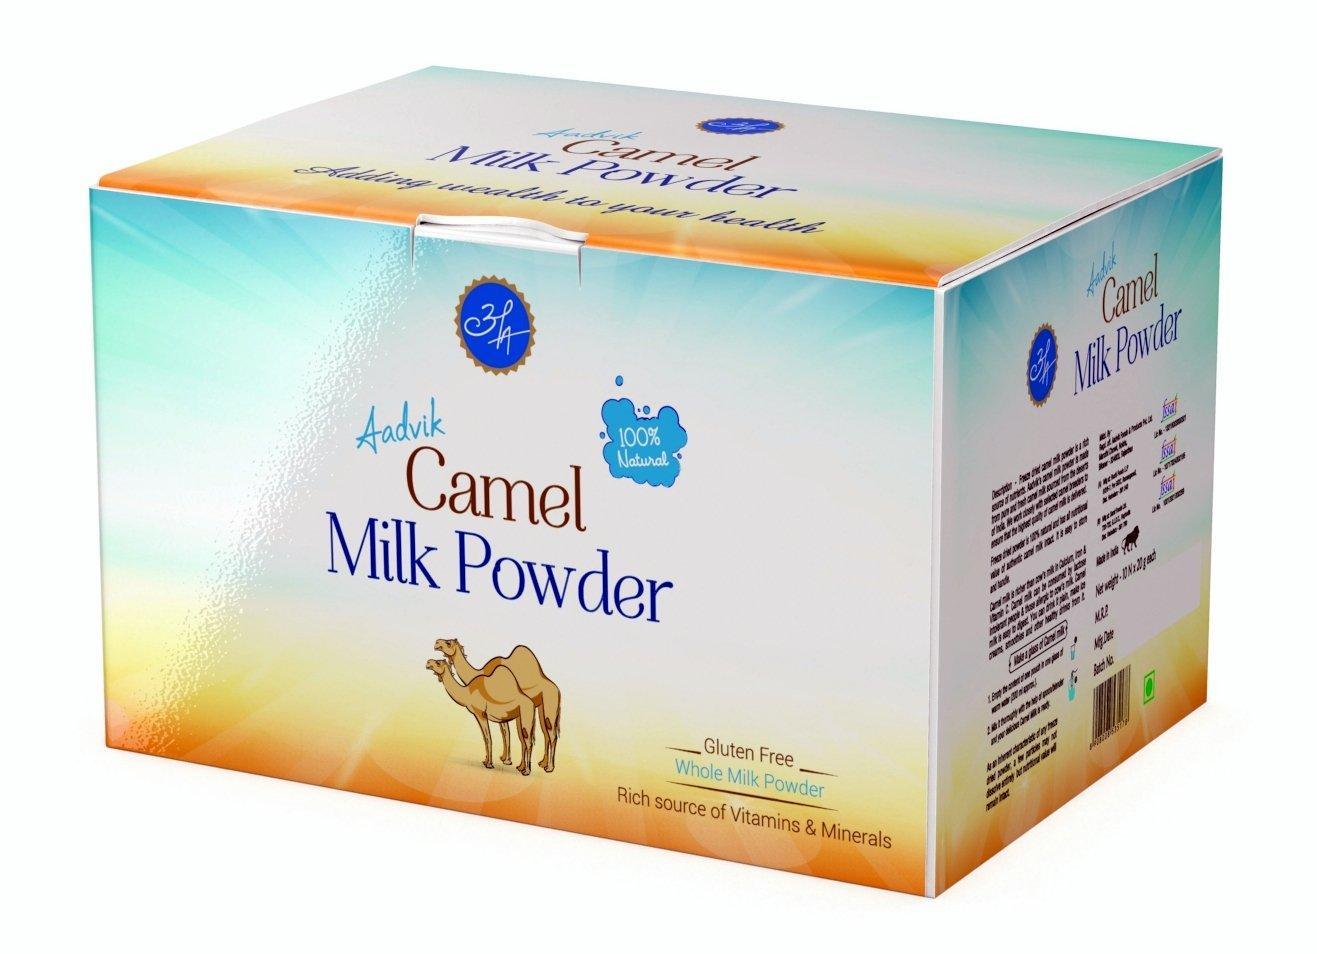 Aadvik Camel Milk Powder 0.7 Oz x 10 servings, 7 Oz makes 70 fl oz (Freeze Dried, Gluten free, no additives, no preservatives)